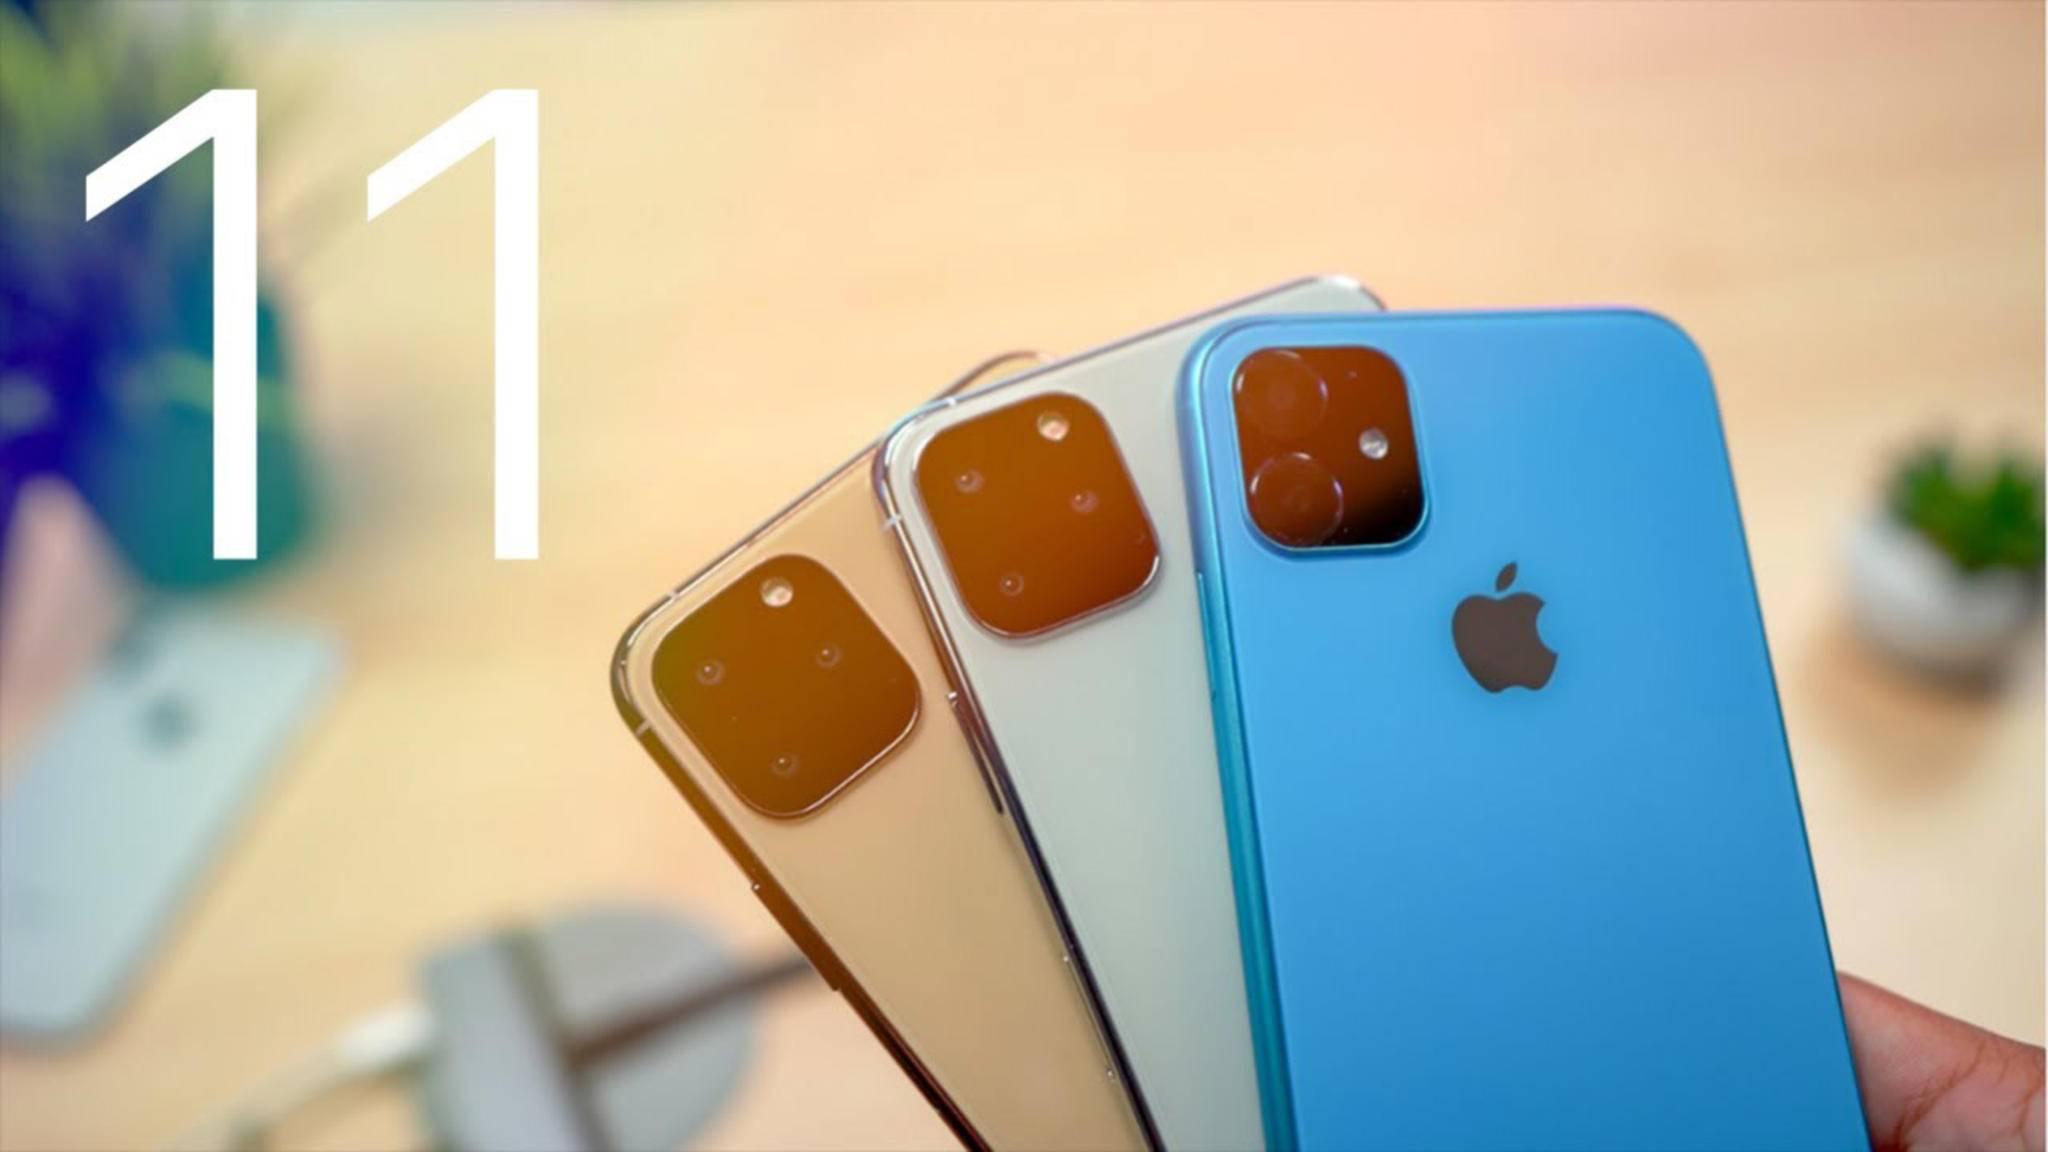 Die neue Triple-Cam des iPhone 11 soll besonders in Low-Light-Umgebungen punkten.